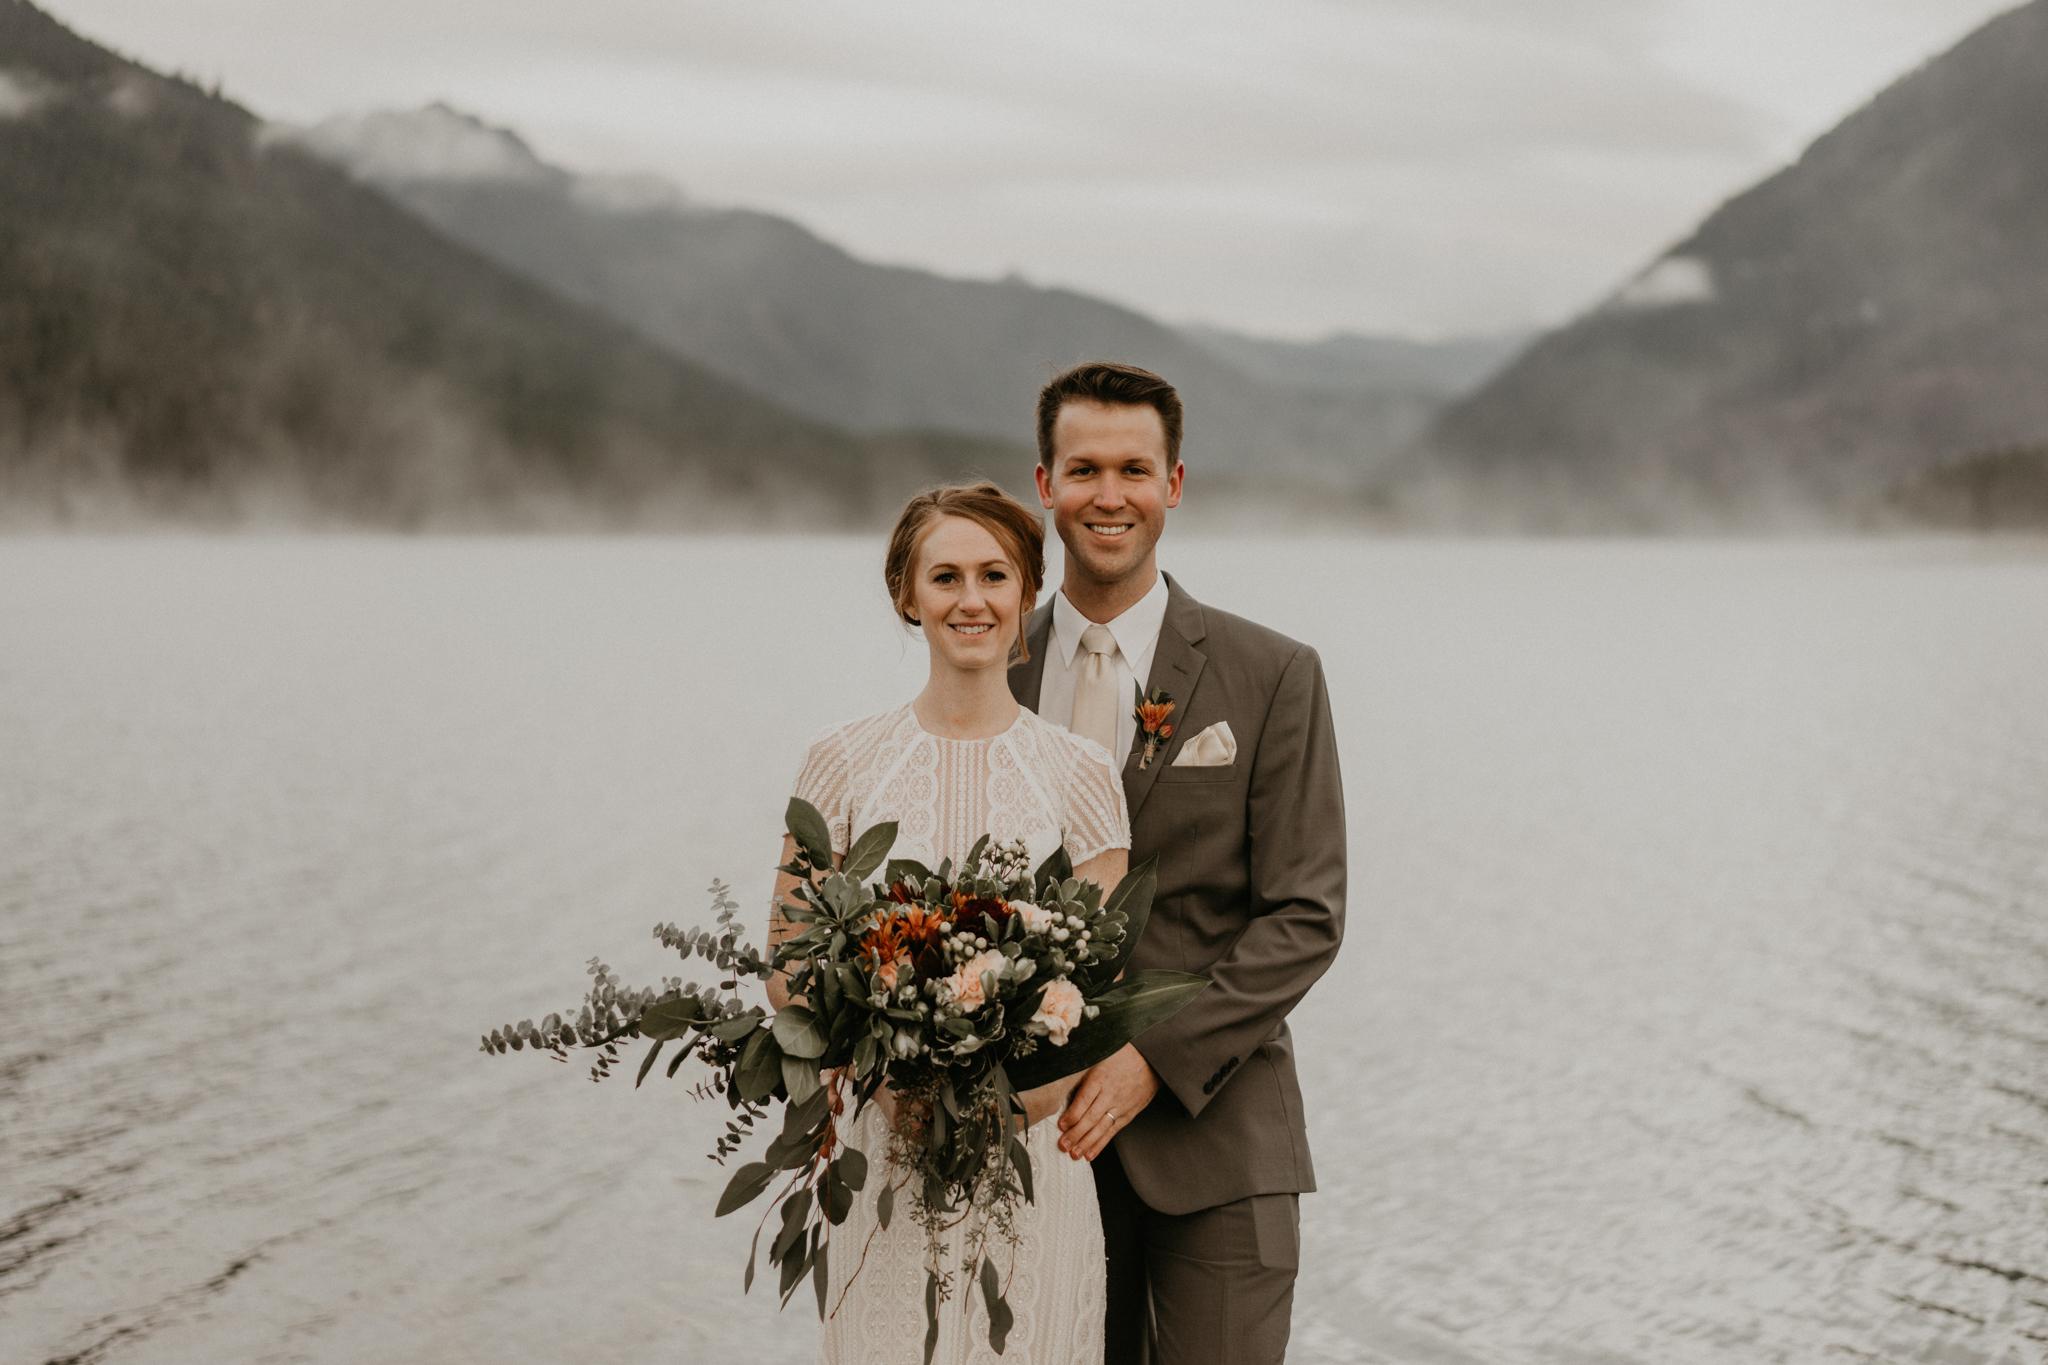 Lake-Cushman-Wedding-Elopement-Engagement-Seattle-Washington-PNW-Adventure-Nature-Photographer-5.jpg